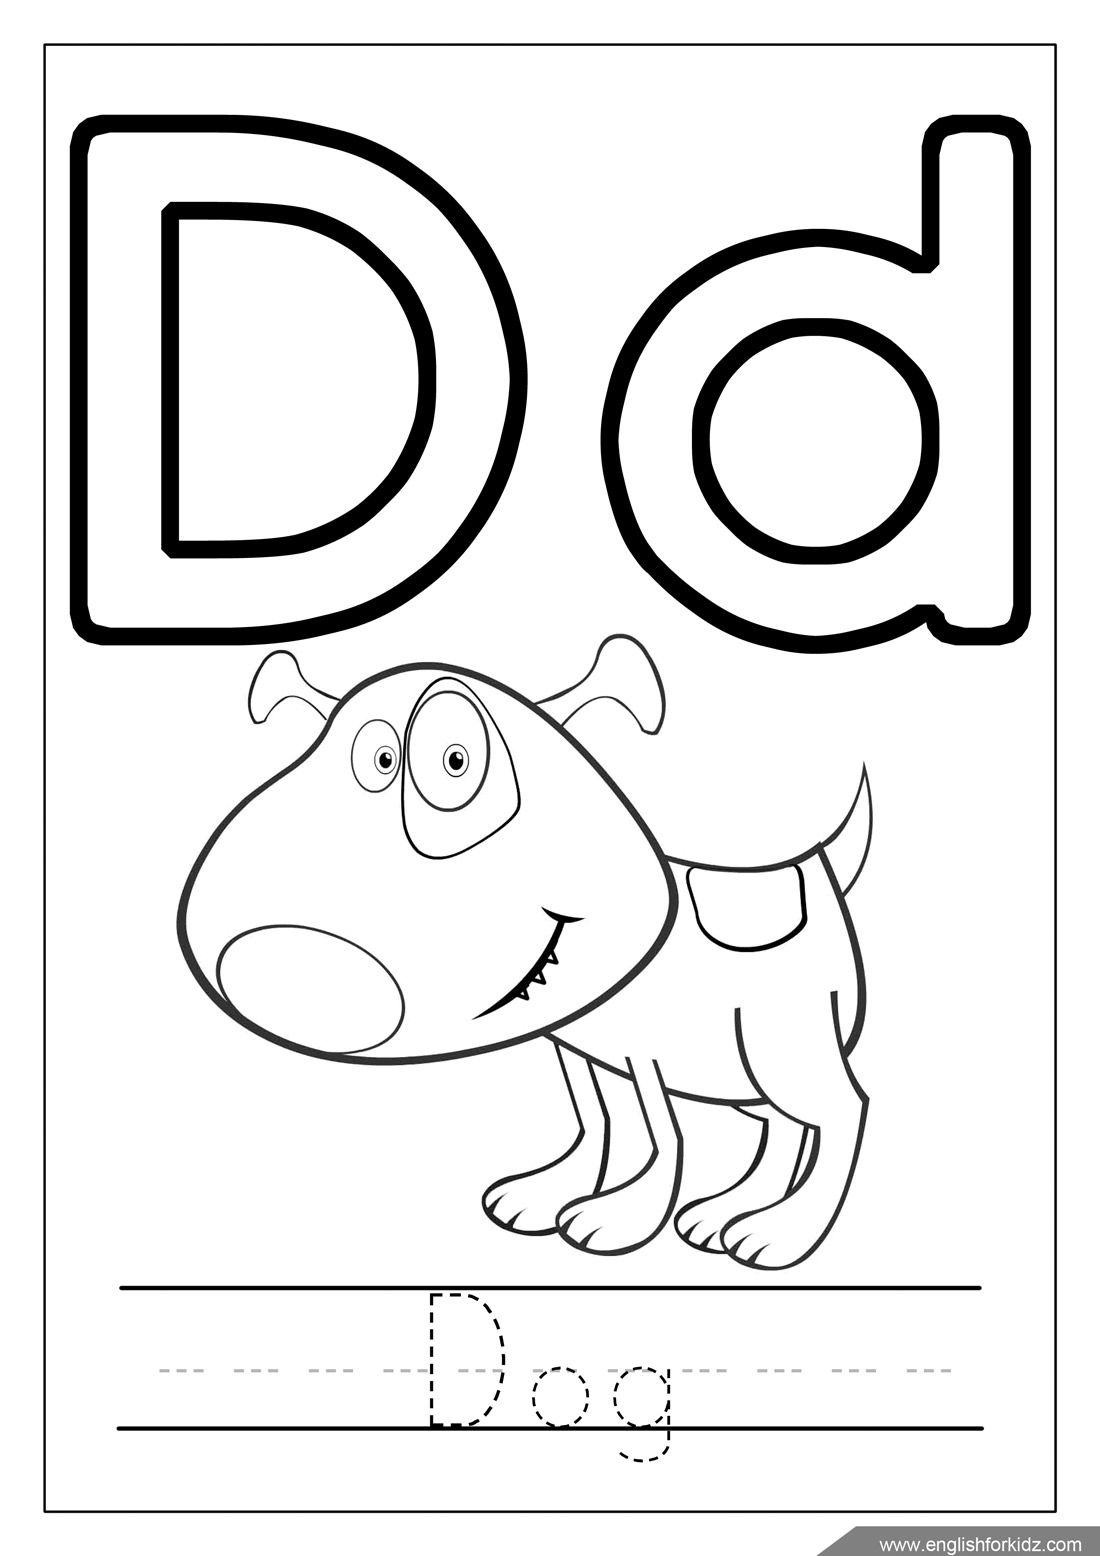 Alphabet Coloring Page Letter D Coloring D Is For Dog Alphabet Coloring Pages Abc Coloring Pages Letter A Coloring Pages